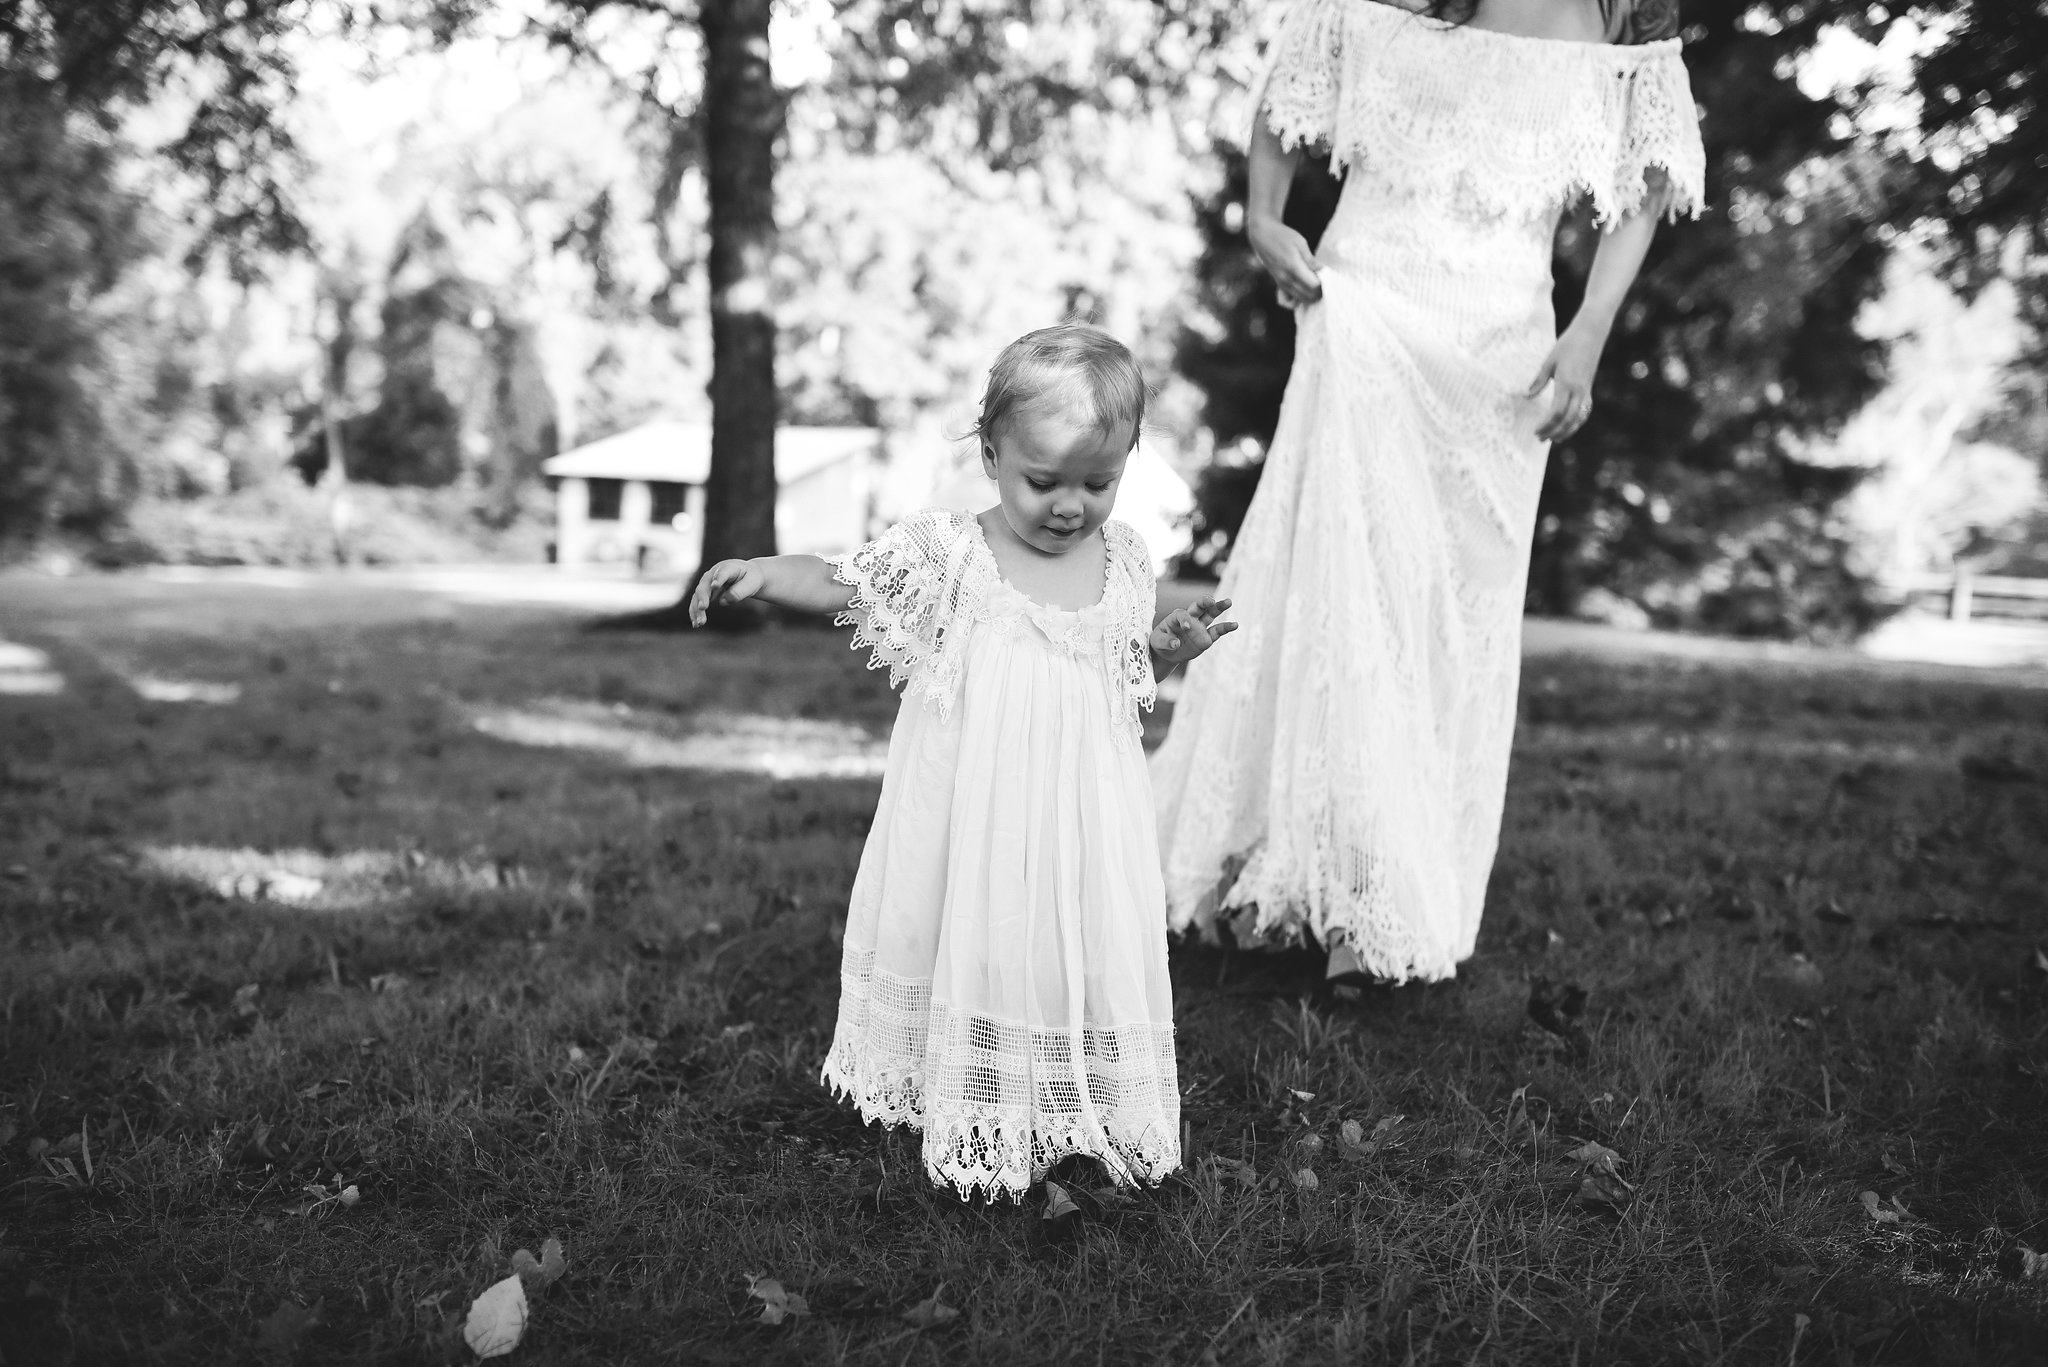 Maryland, Eastern Shore, Baltimore Wedding Photographer, Romantic, Boho, Backyard Wedding, Nature, Bride Walking with Flower Girl in Lace Dress, Black and White Photo